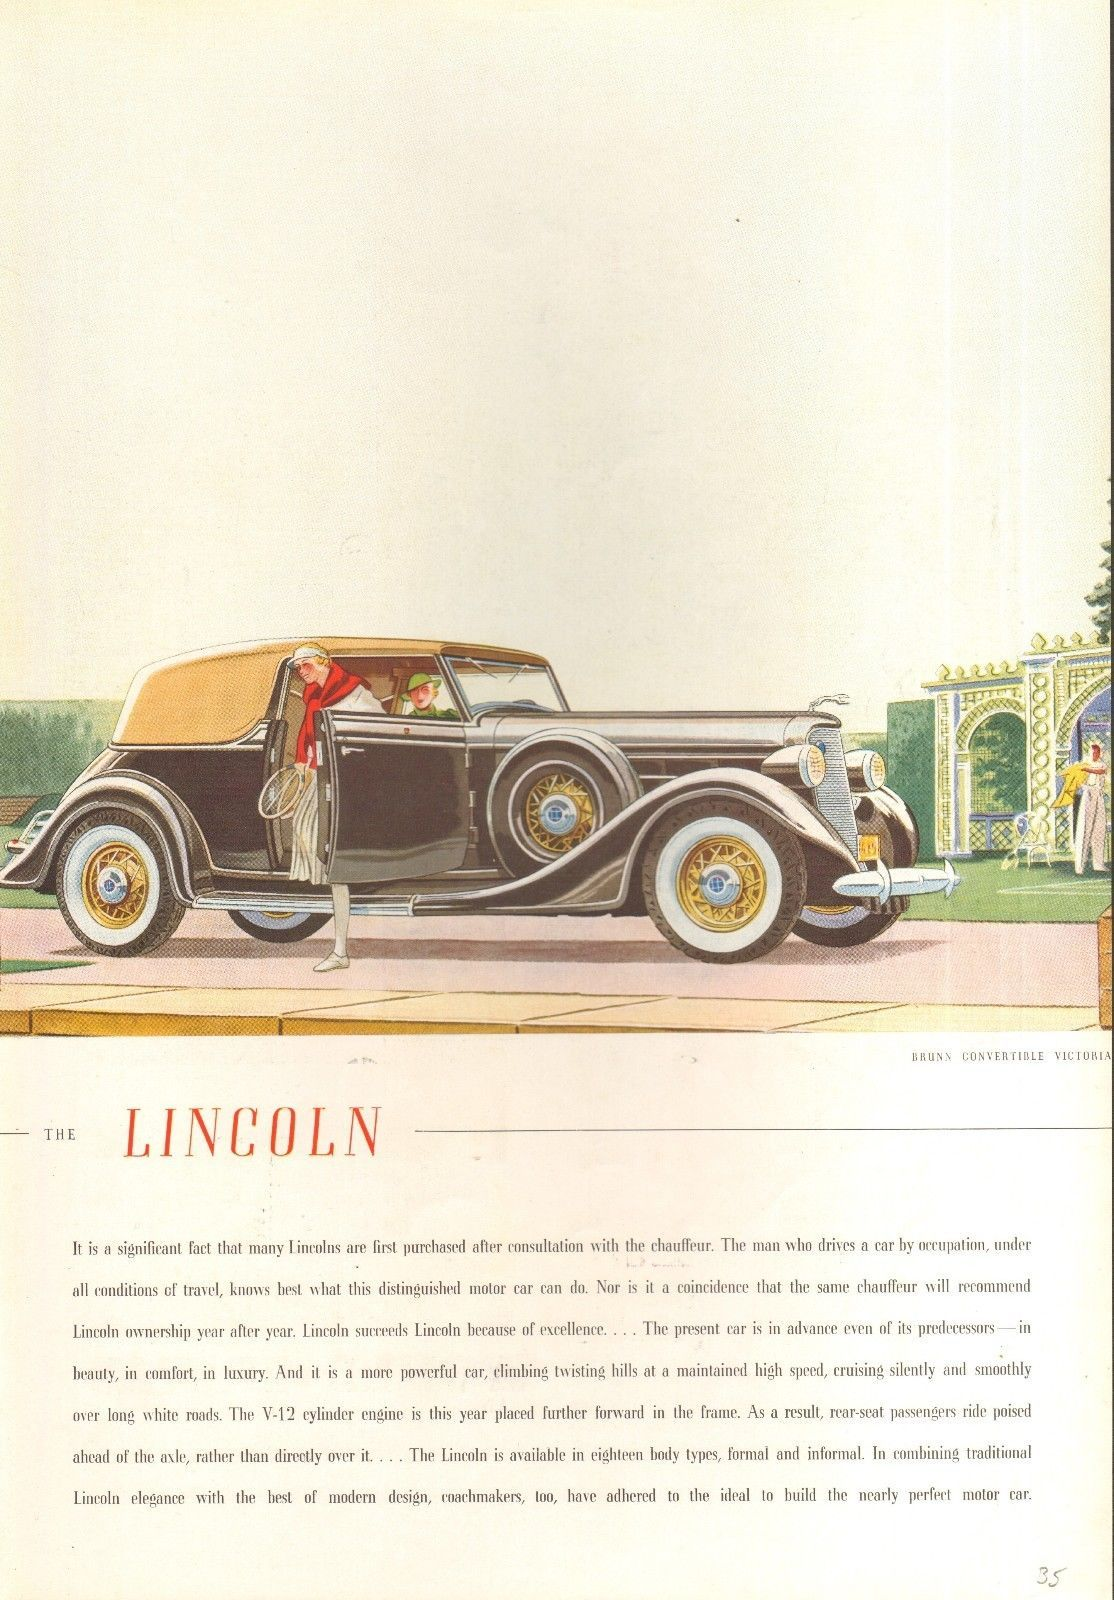 1935 Lincoln Brunn Convertible Victoria Brown Tan Original Vintage ...